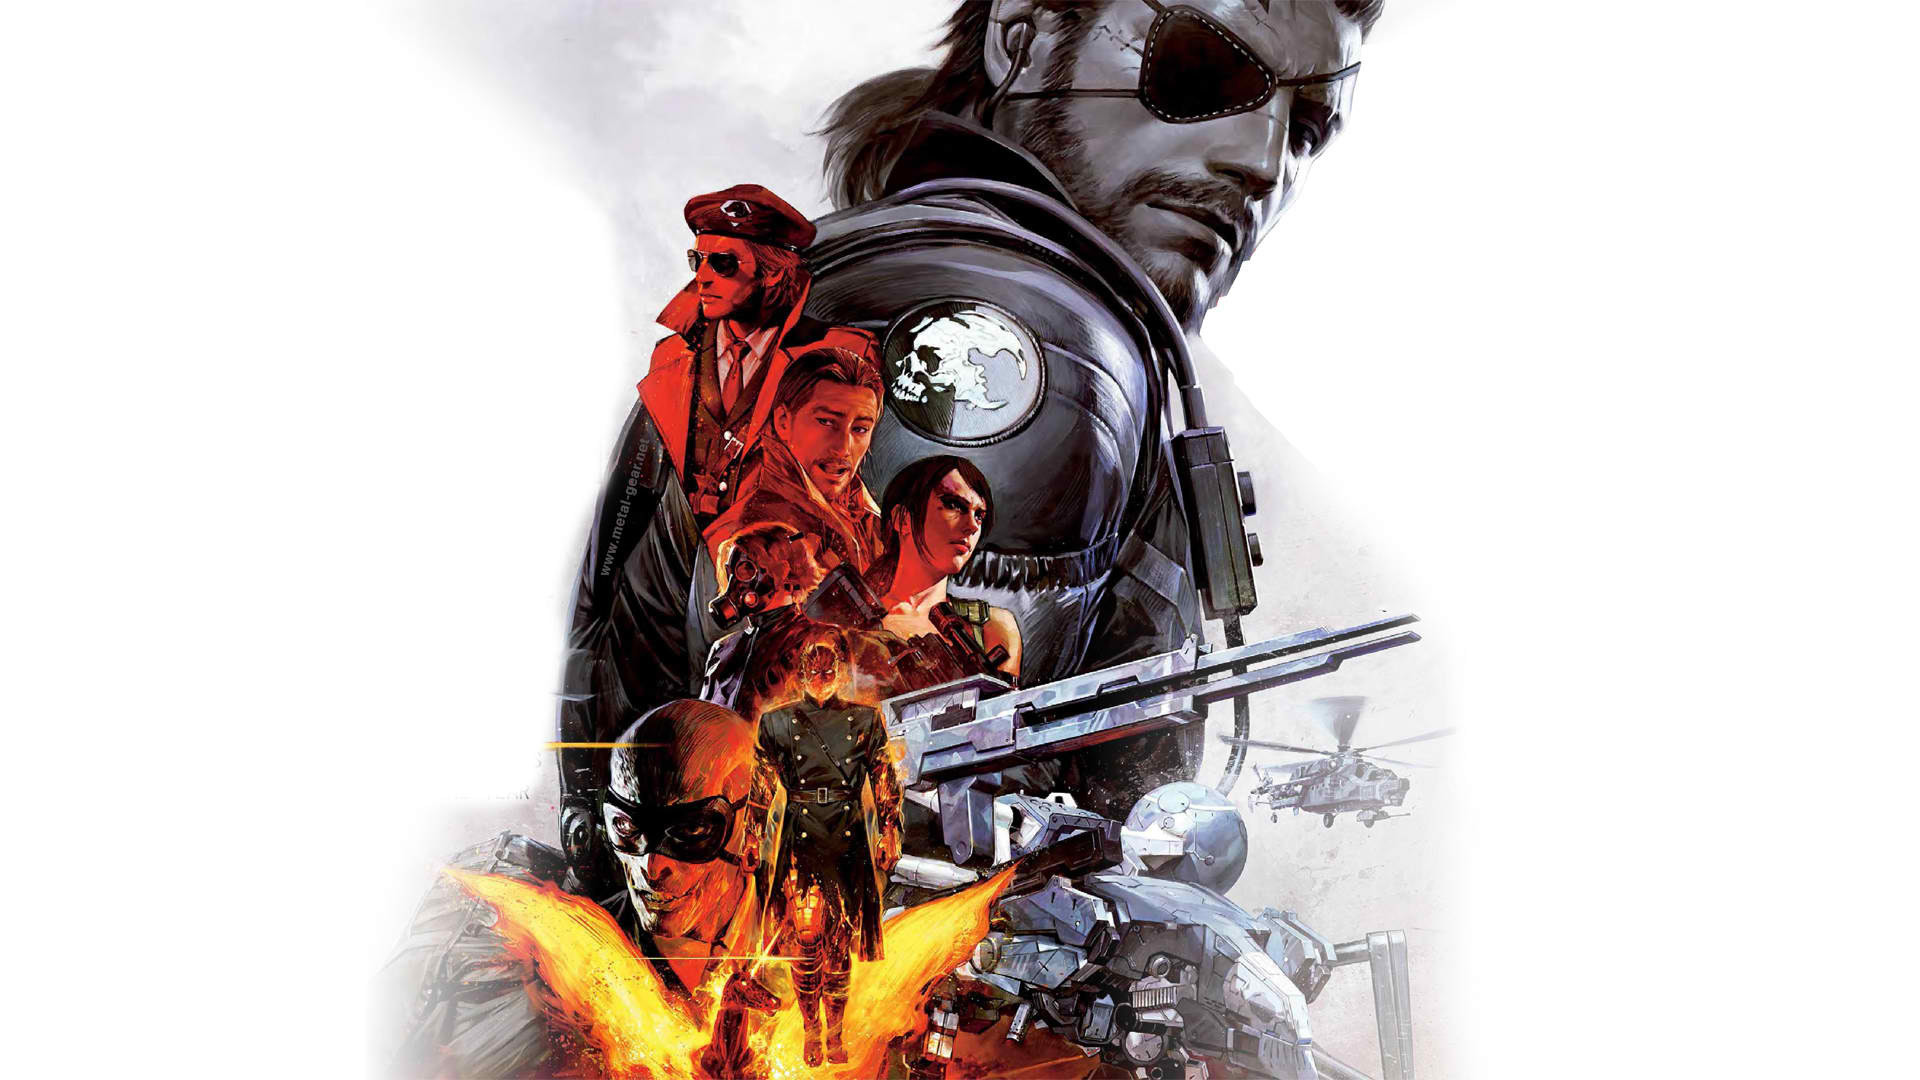 Metal Gear Solid V: The Phantom Pain Wallpaper in 1920×1080